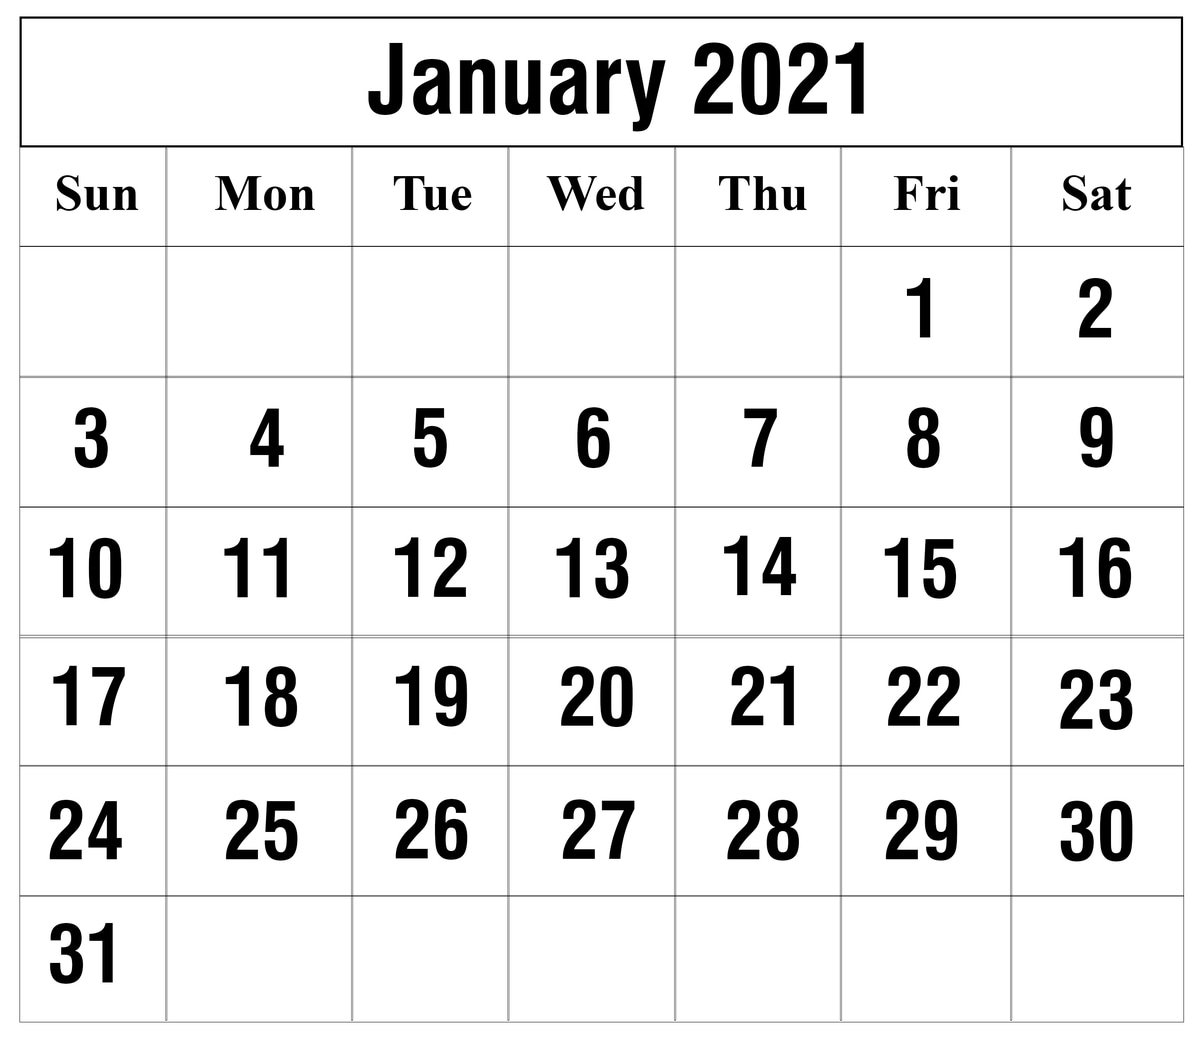 Free January 2021 Printable Calendar Template In Pdf, Excel Regarding Julian Vs Gregorian Calendar 2021